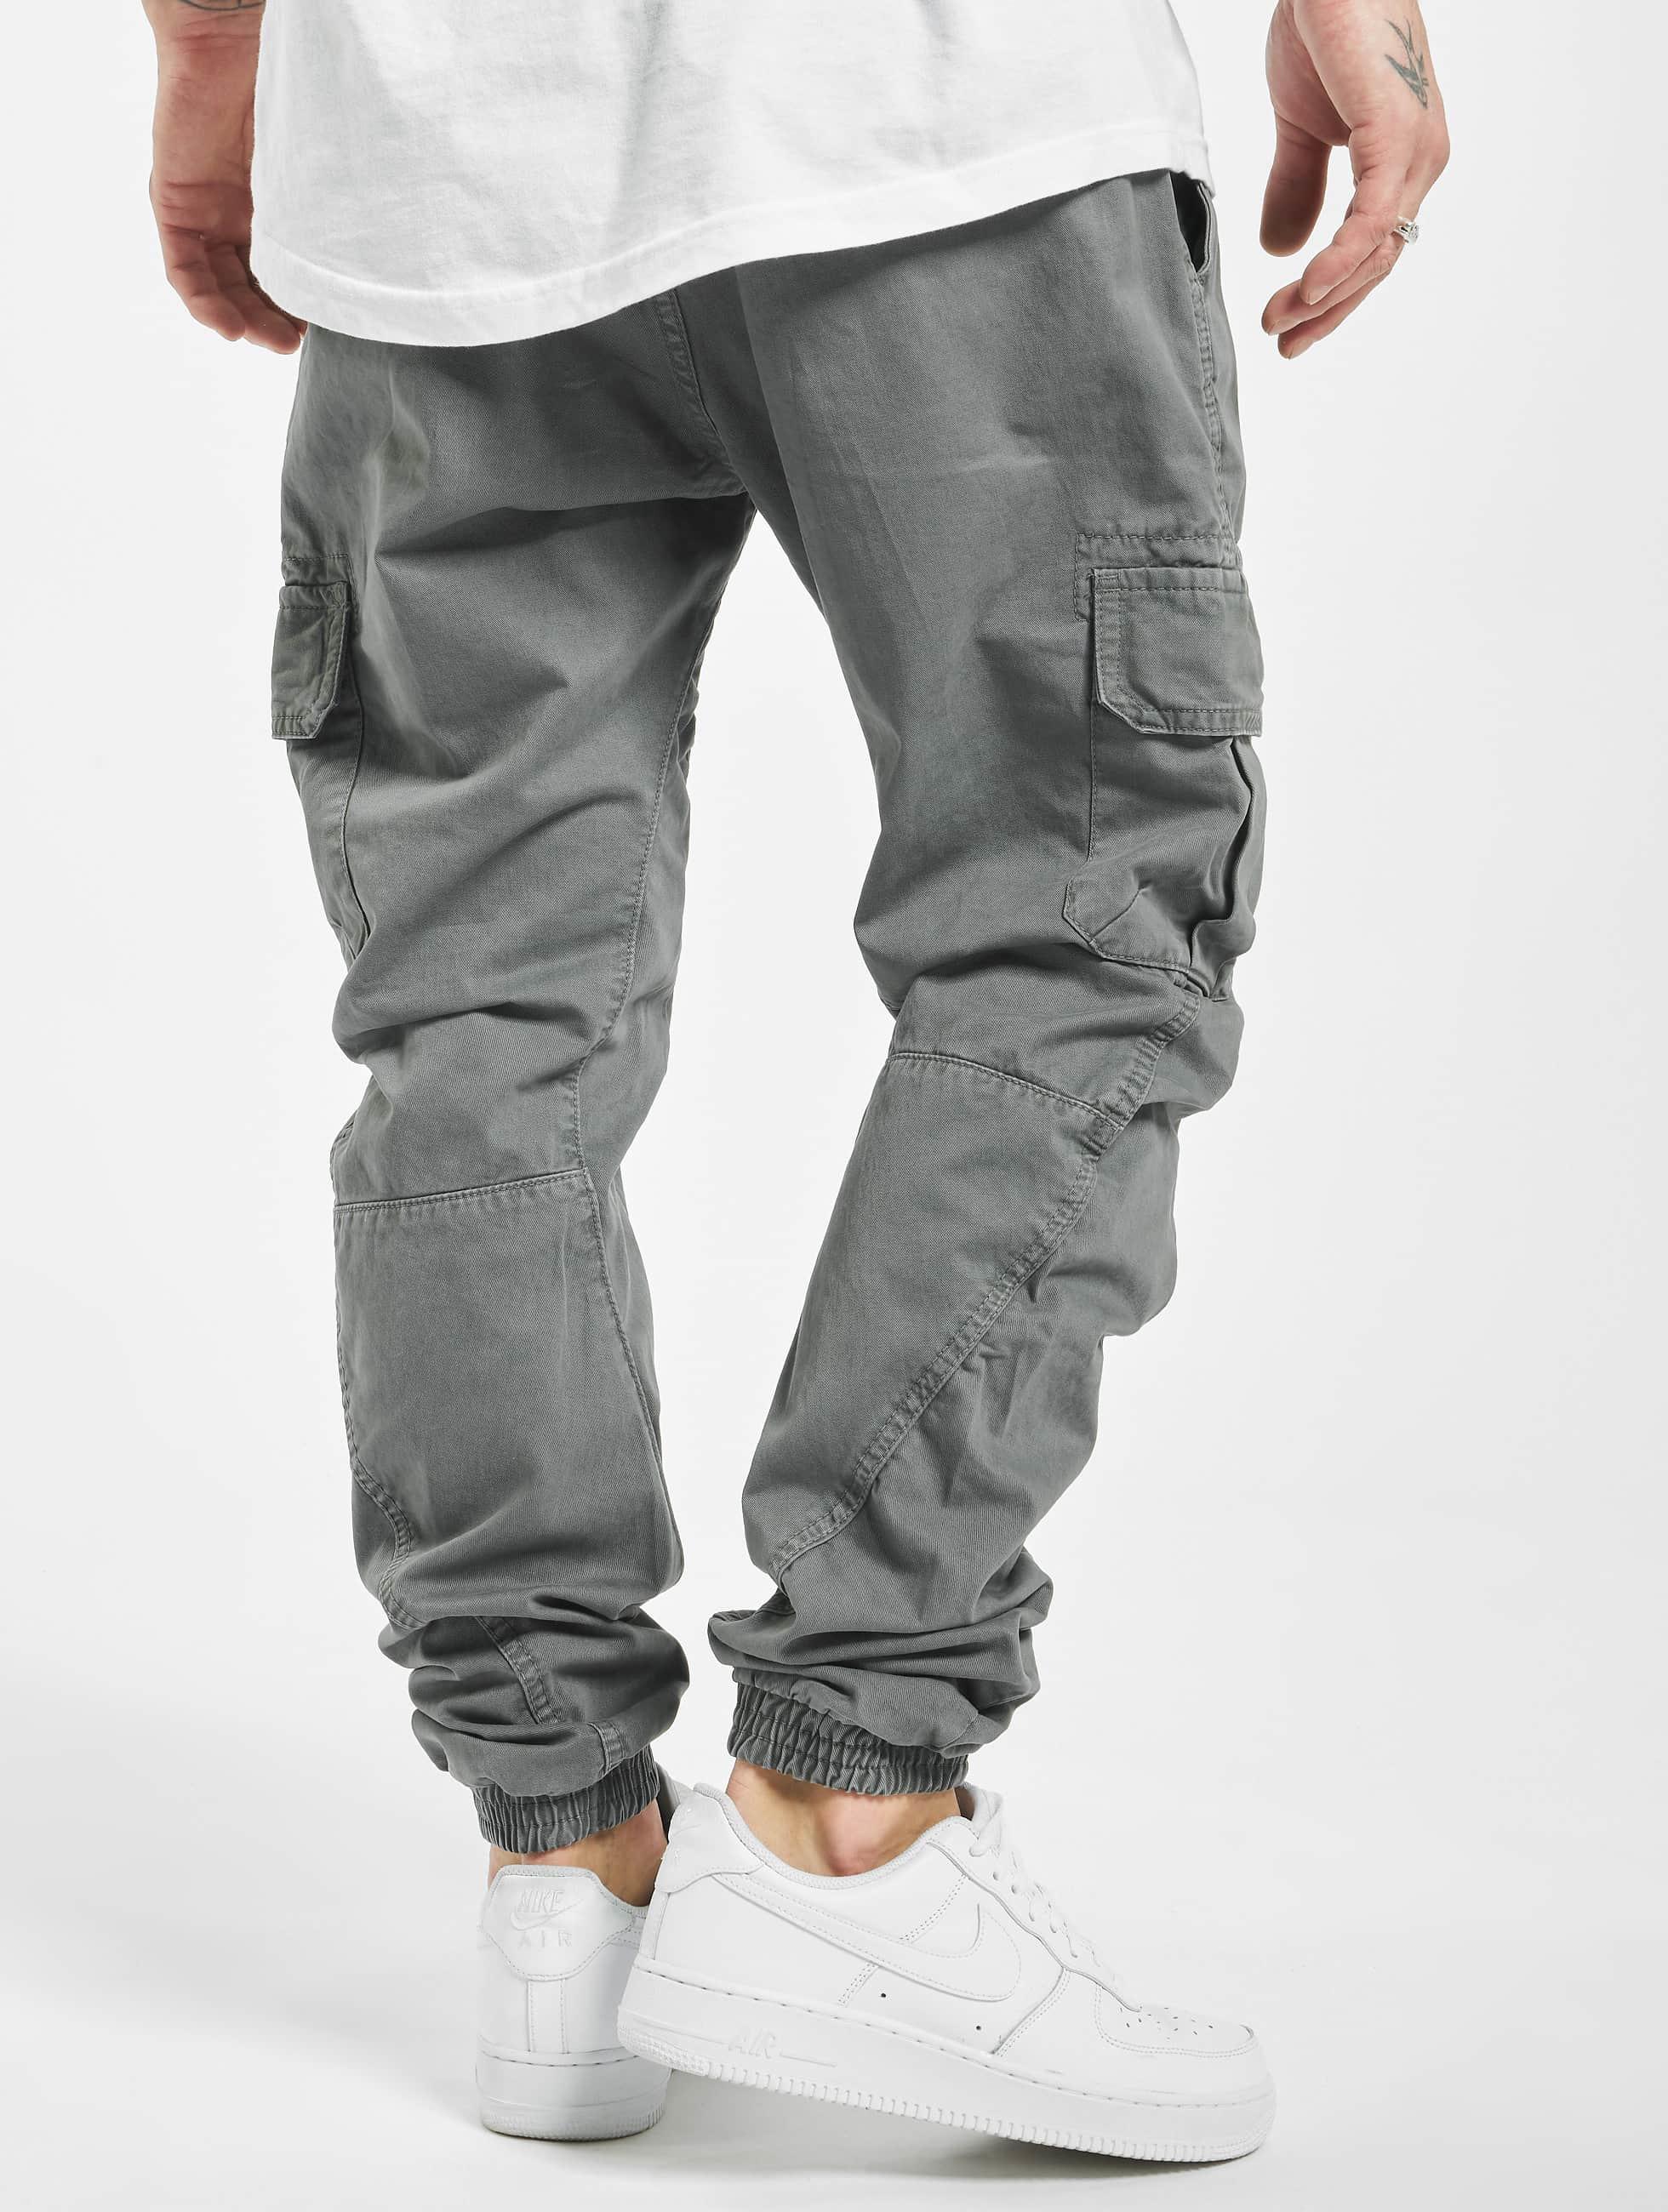 Urban Classics Pantalone ginnico Cargo Jogging grigio